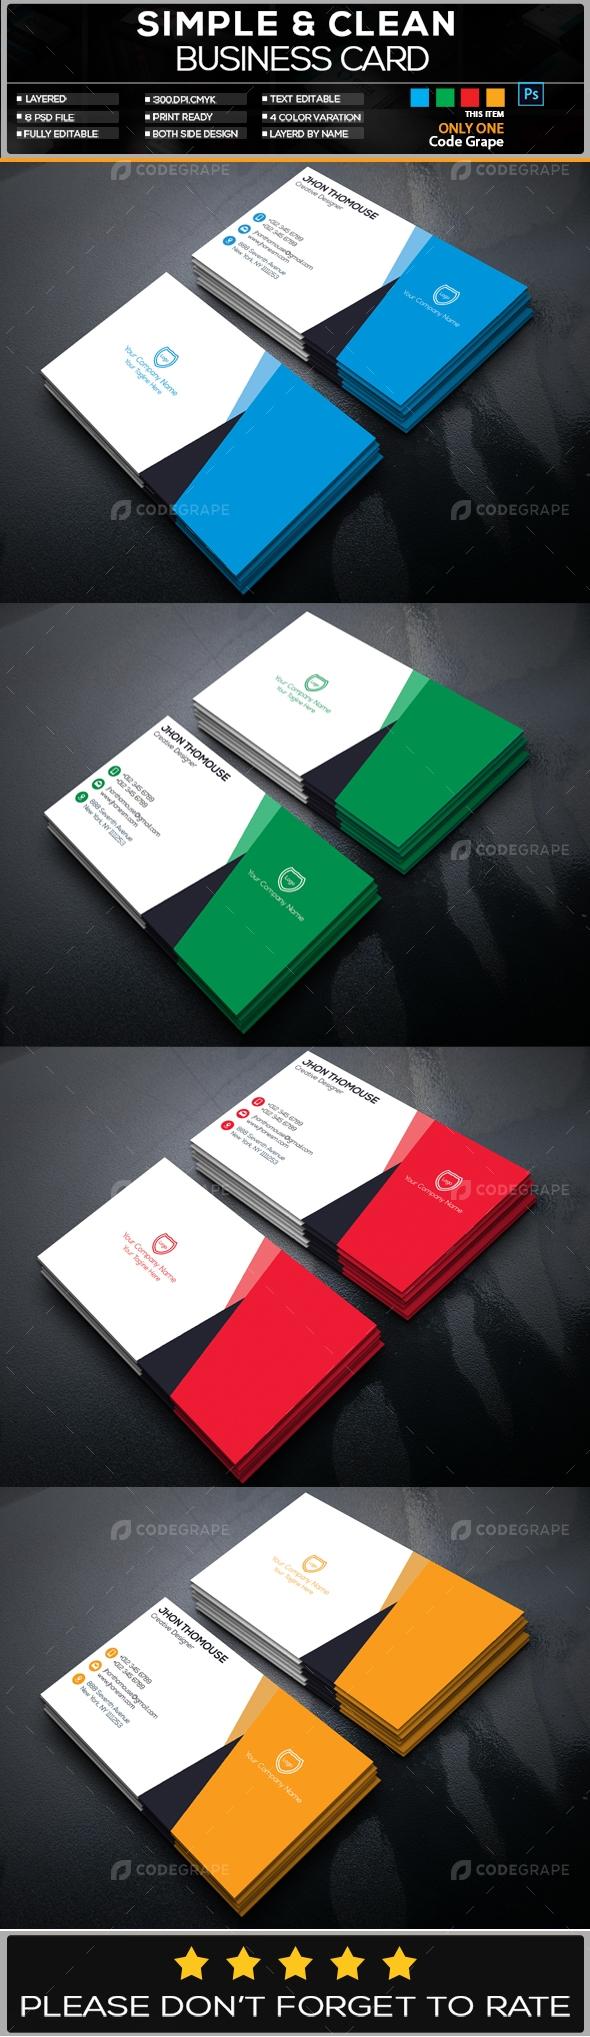 Creative Business Card Vol - 7